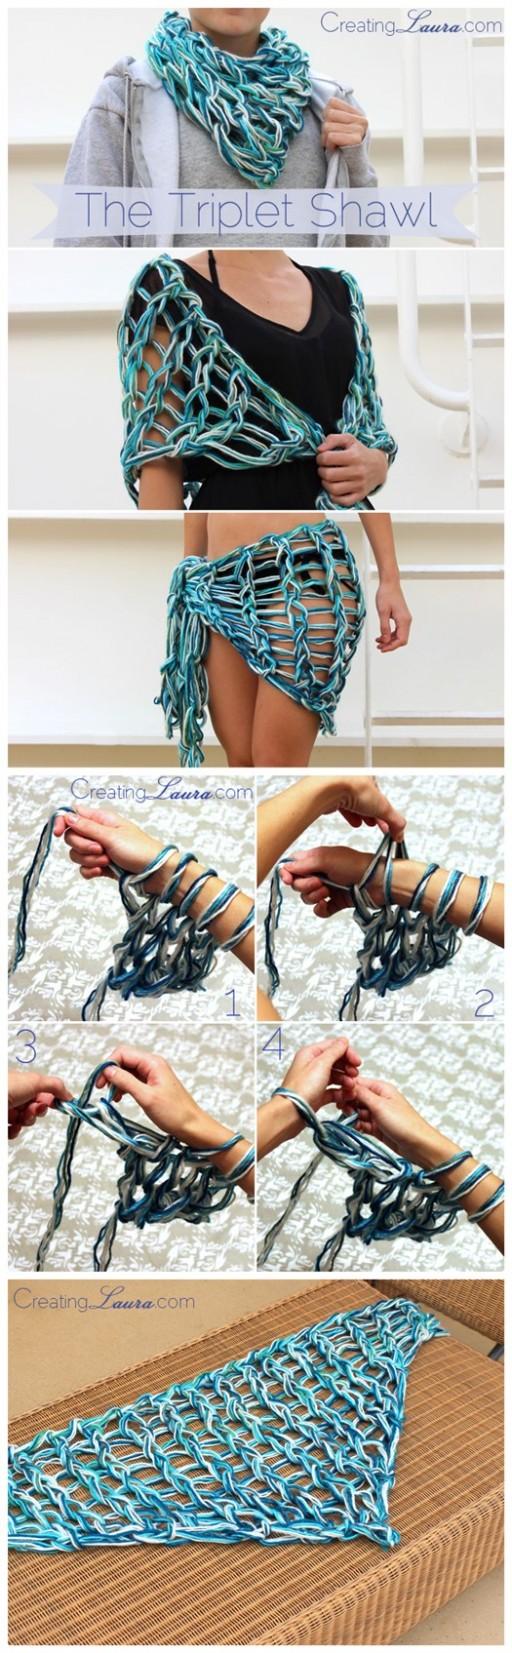 DIY Triplet Shawl Free Arm Knitting Pattern 2